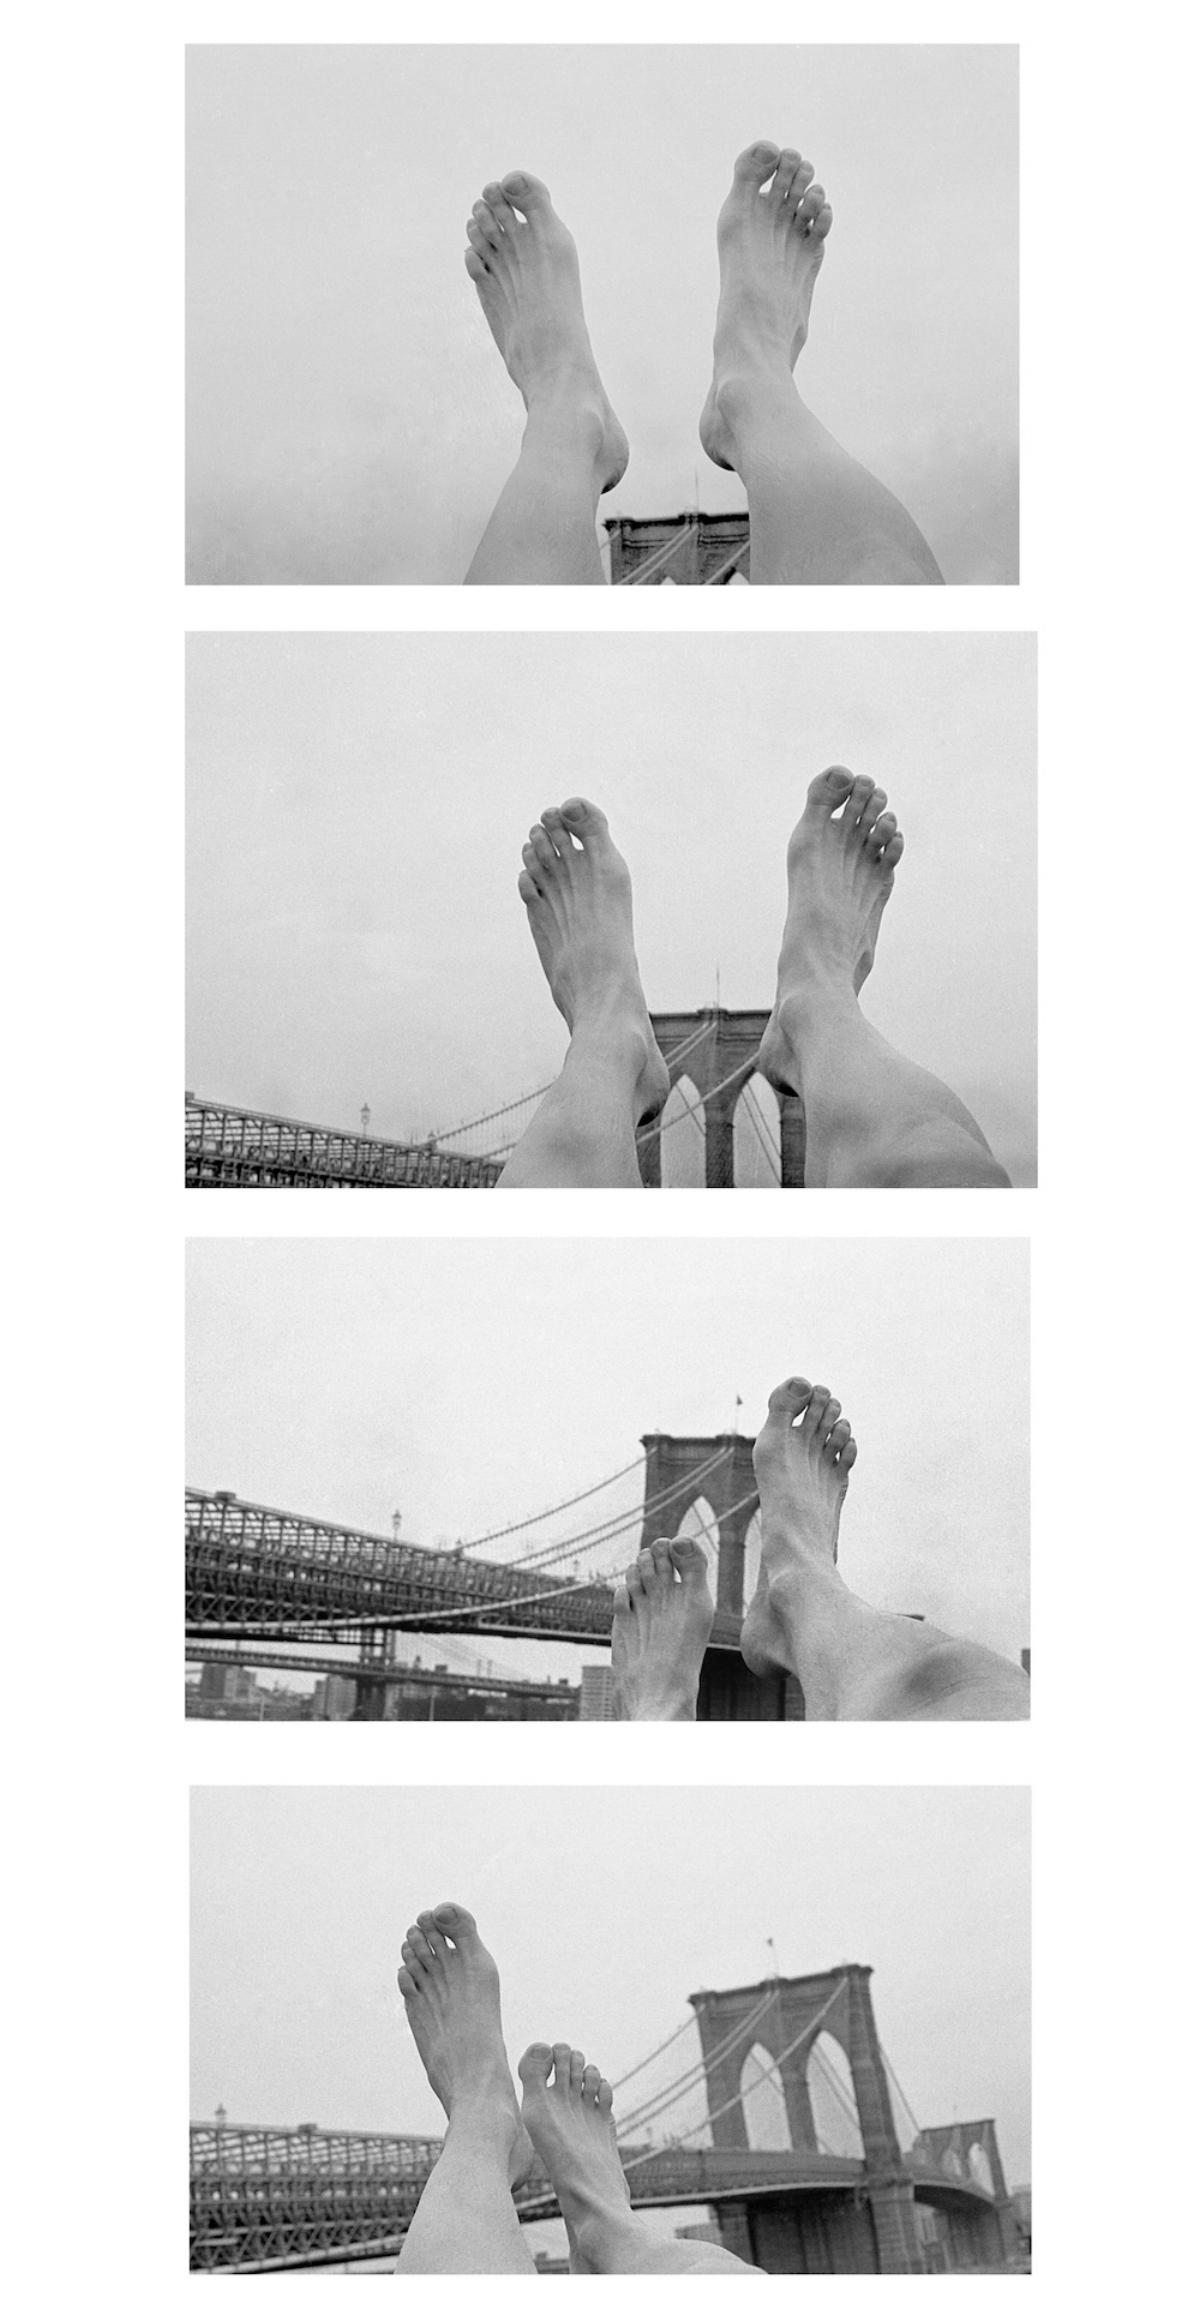 Brooklyn Bridge feet